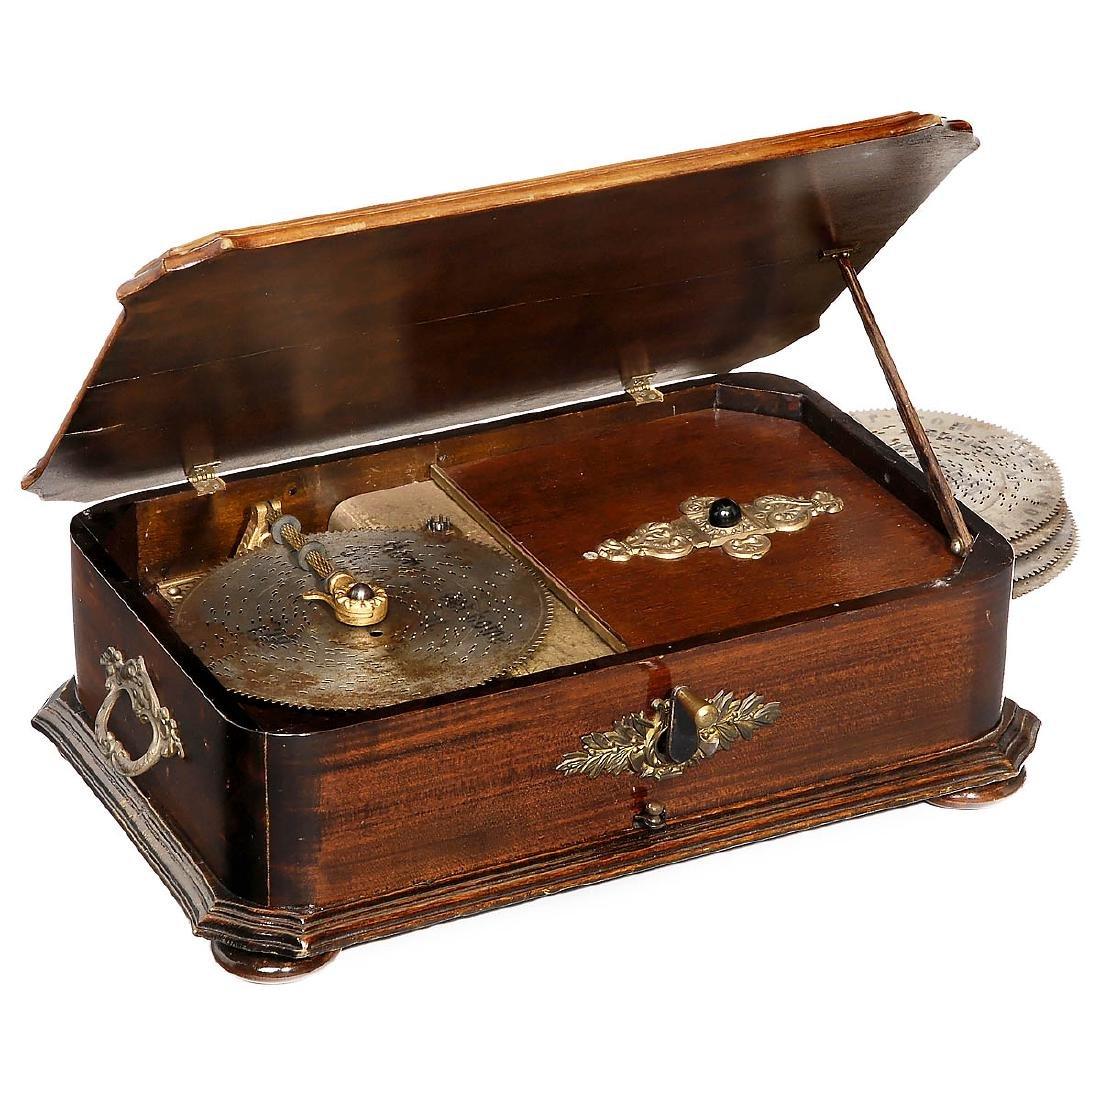 Kalliope Disc Musical Box, c. 1900